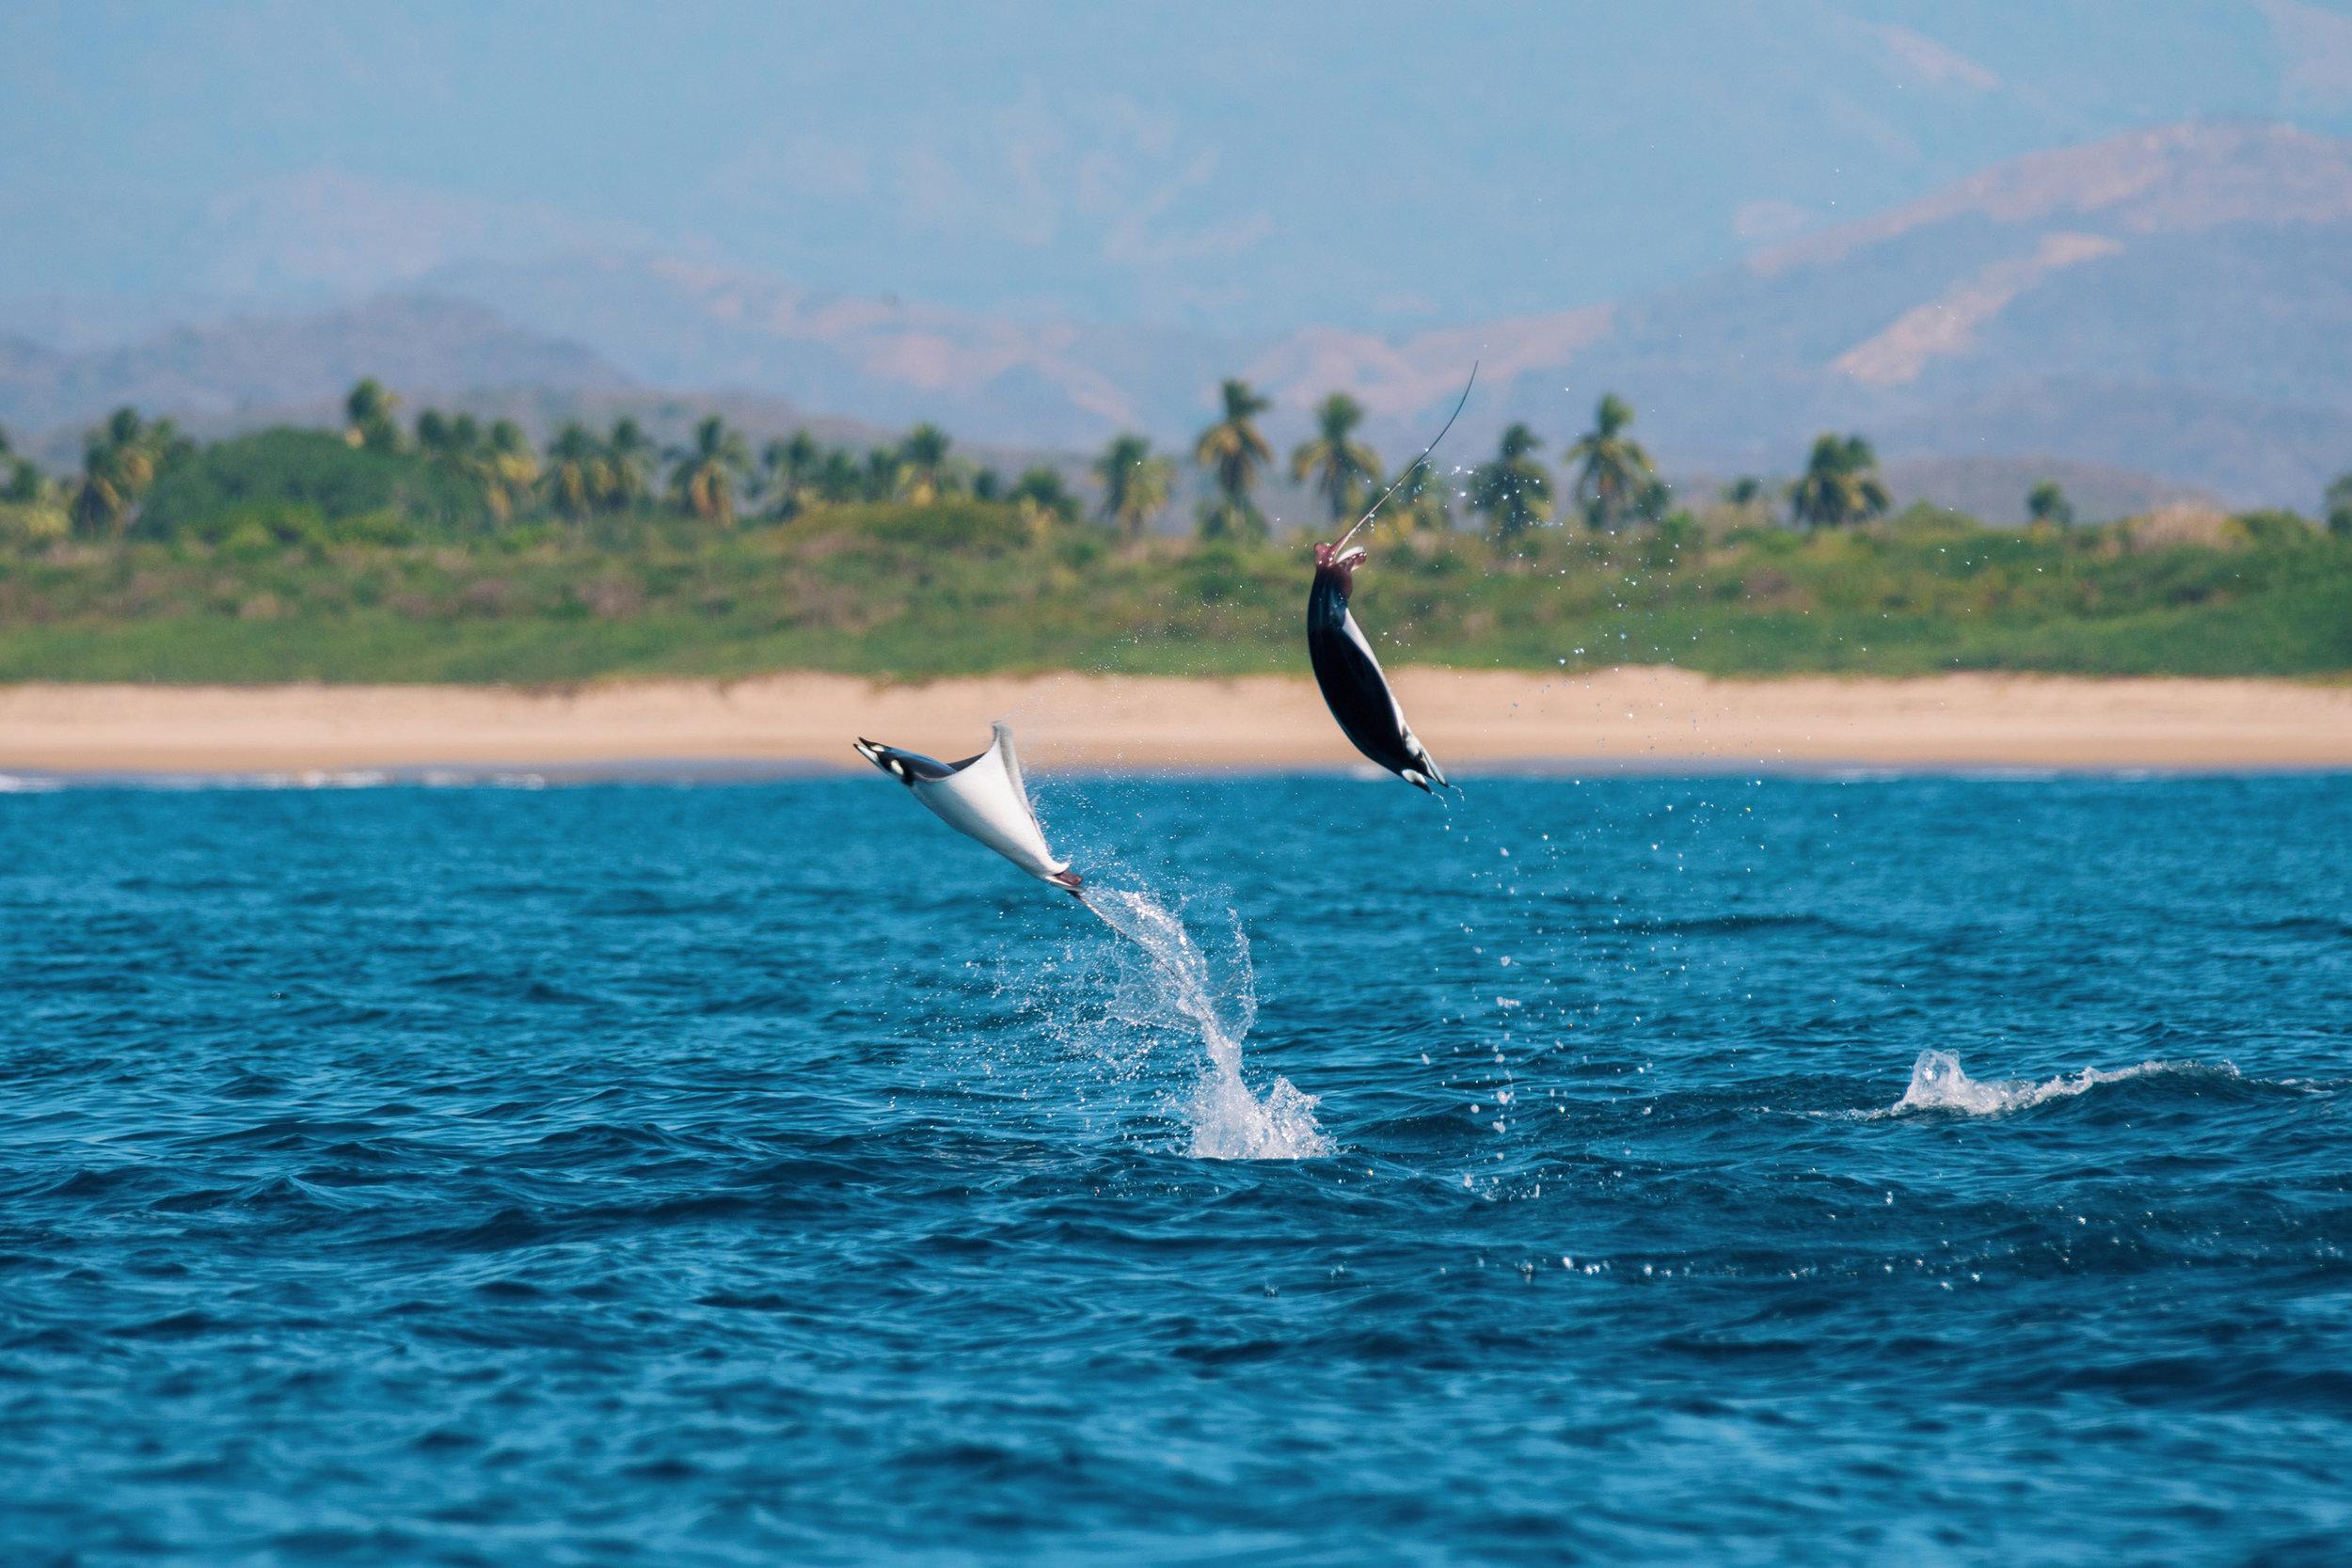 Ballenas-Ixtapa-Zihuatanejo-Fotografia-Heiko-Bothe-8.JPG